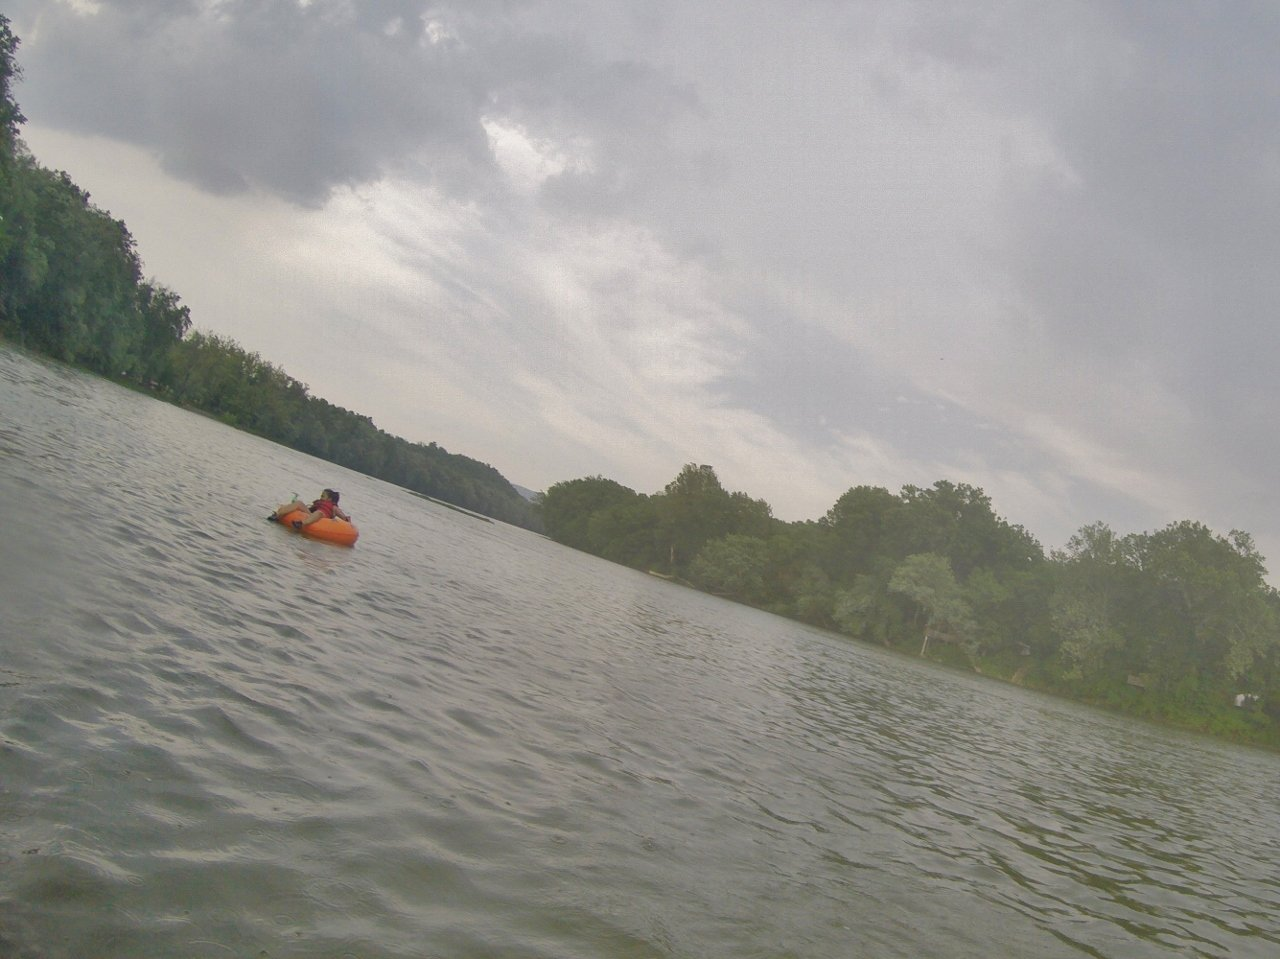 Tubing in Shenandoah River